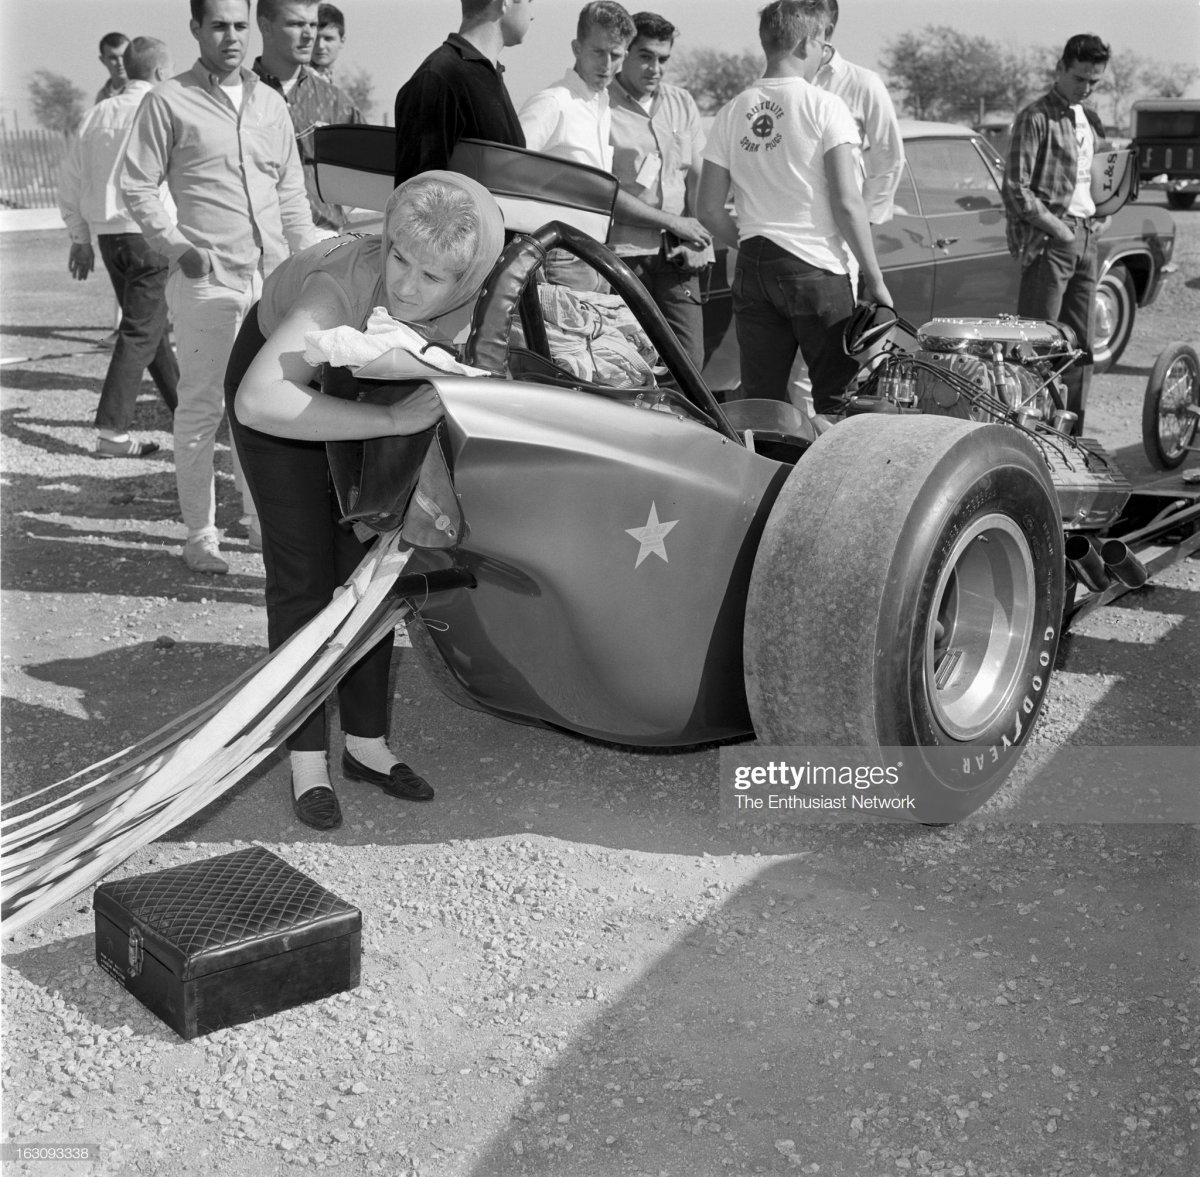 64 1965 NHRA World Championship and Tulsa Invitational Drag Races.jpg